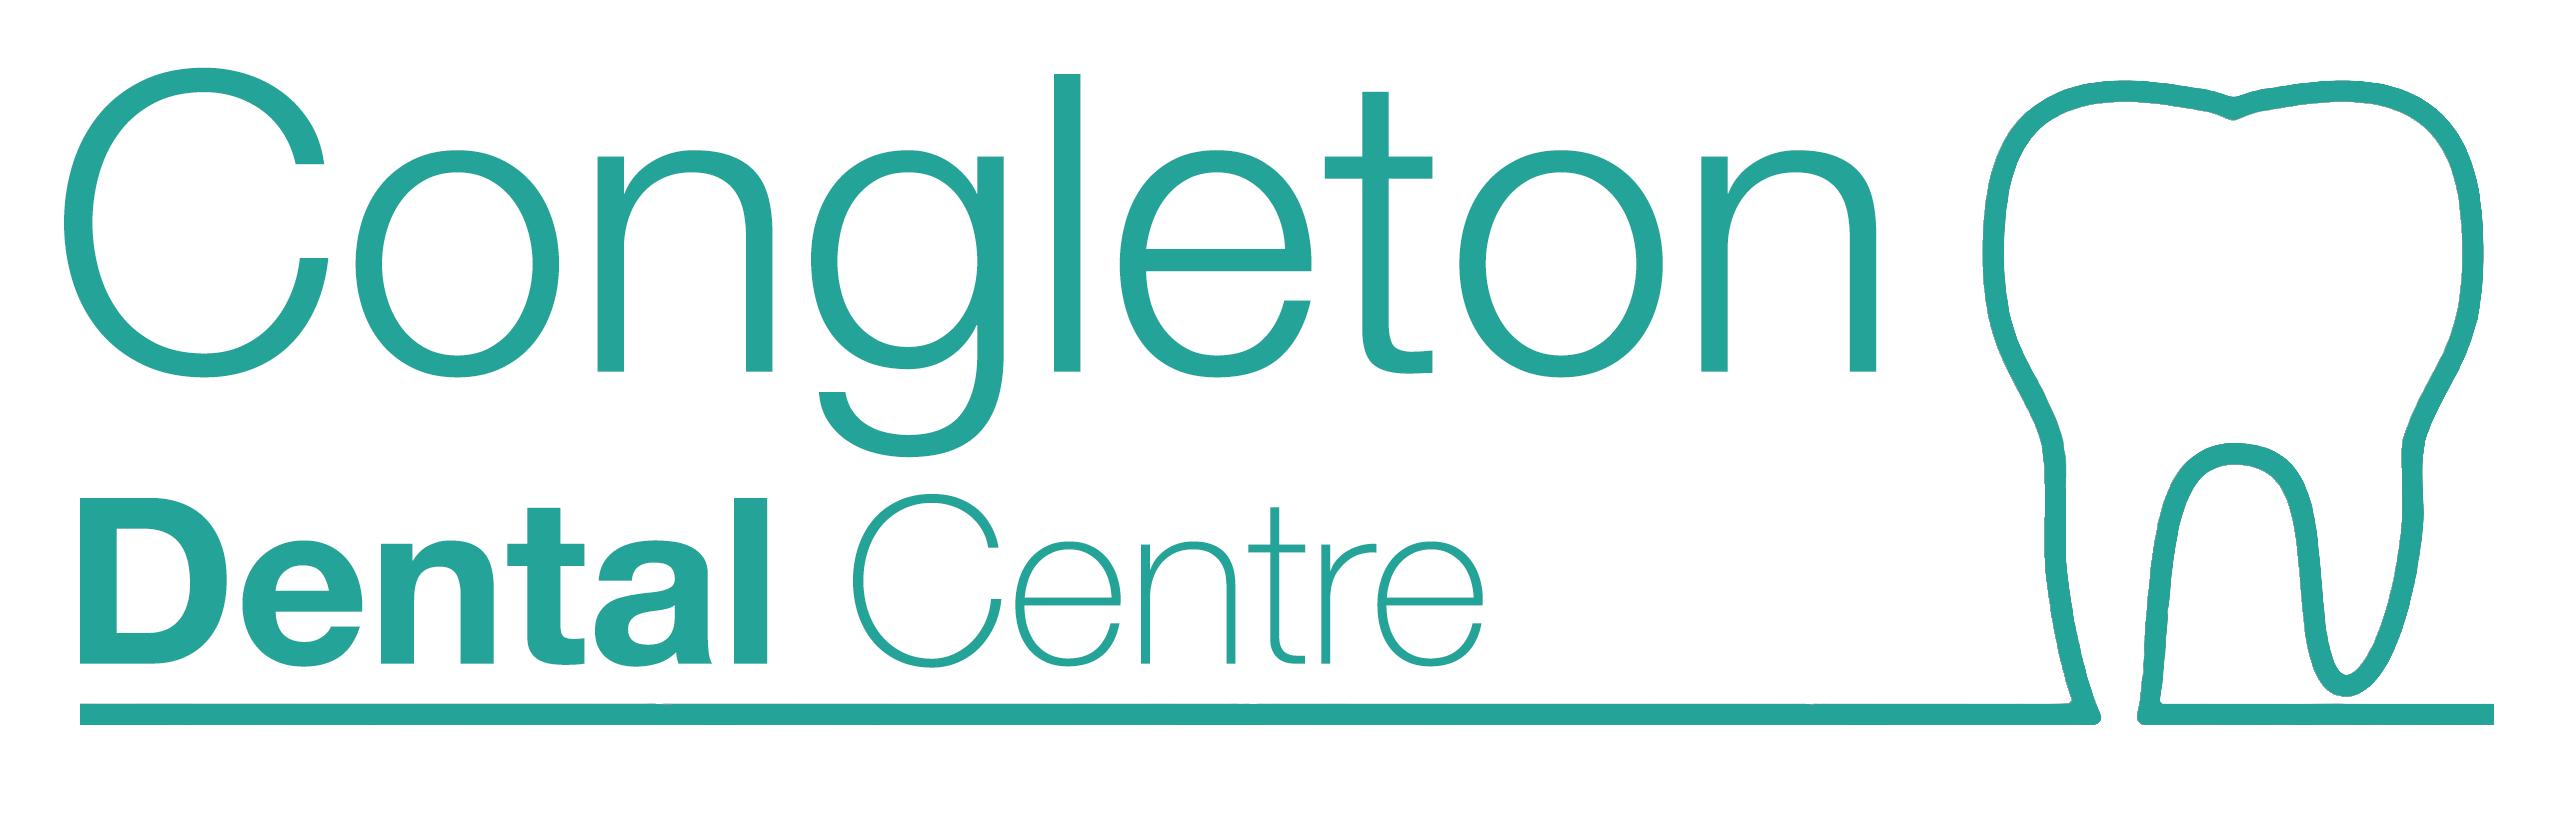 Congleton Dental Centre